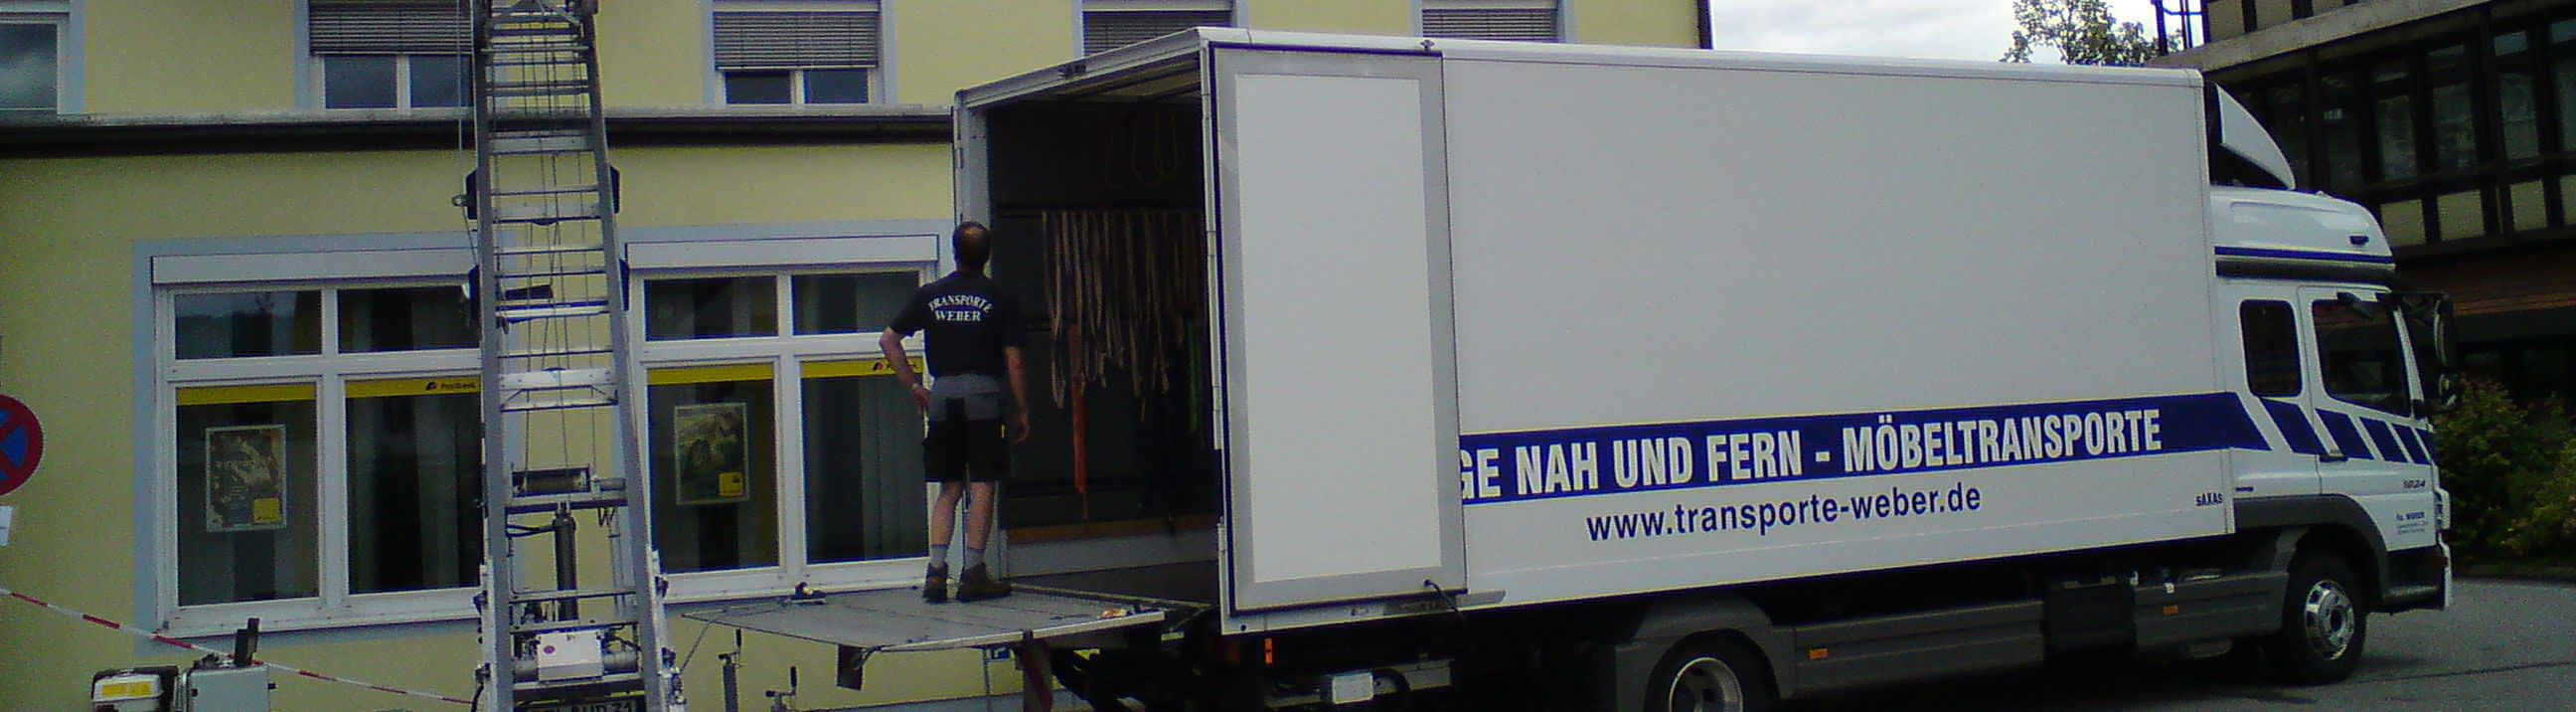 Transporte Weber Umzug